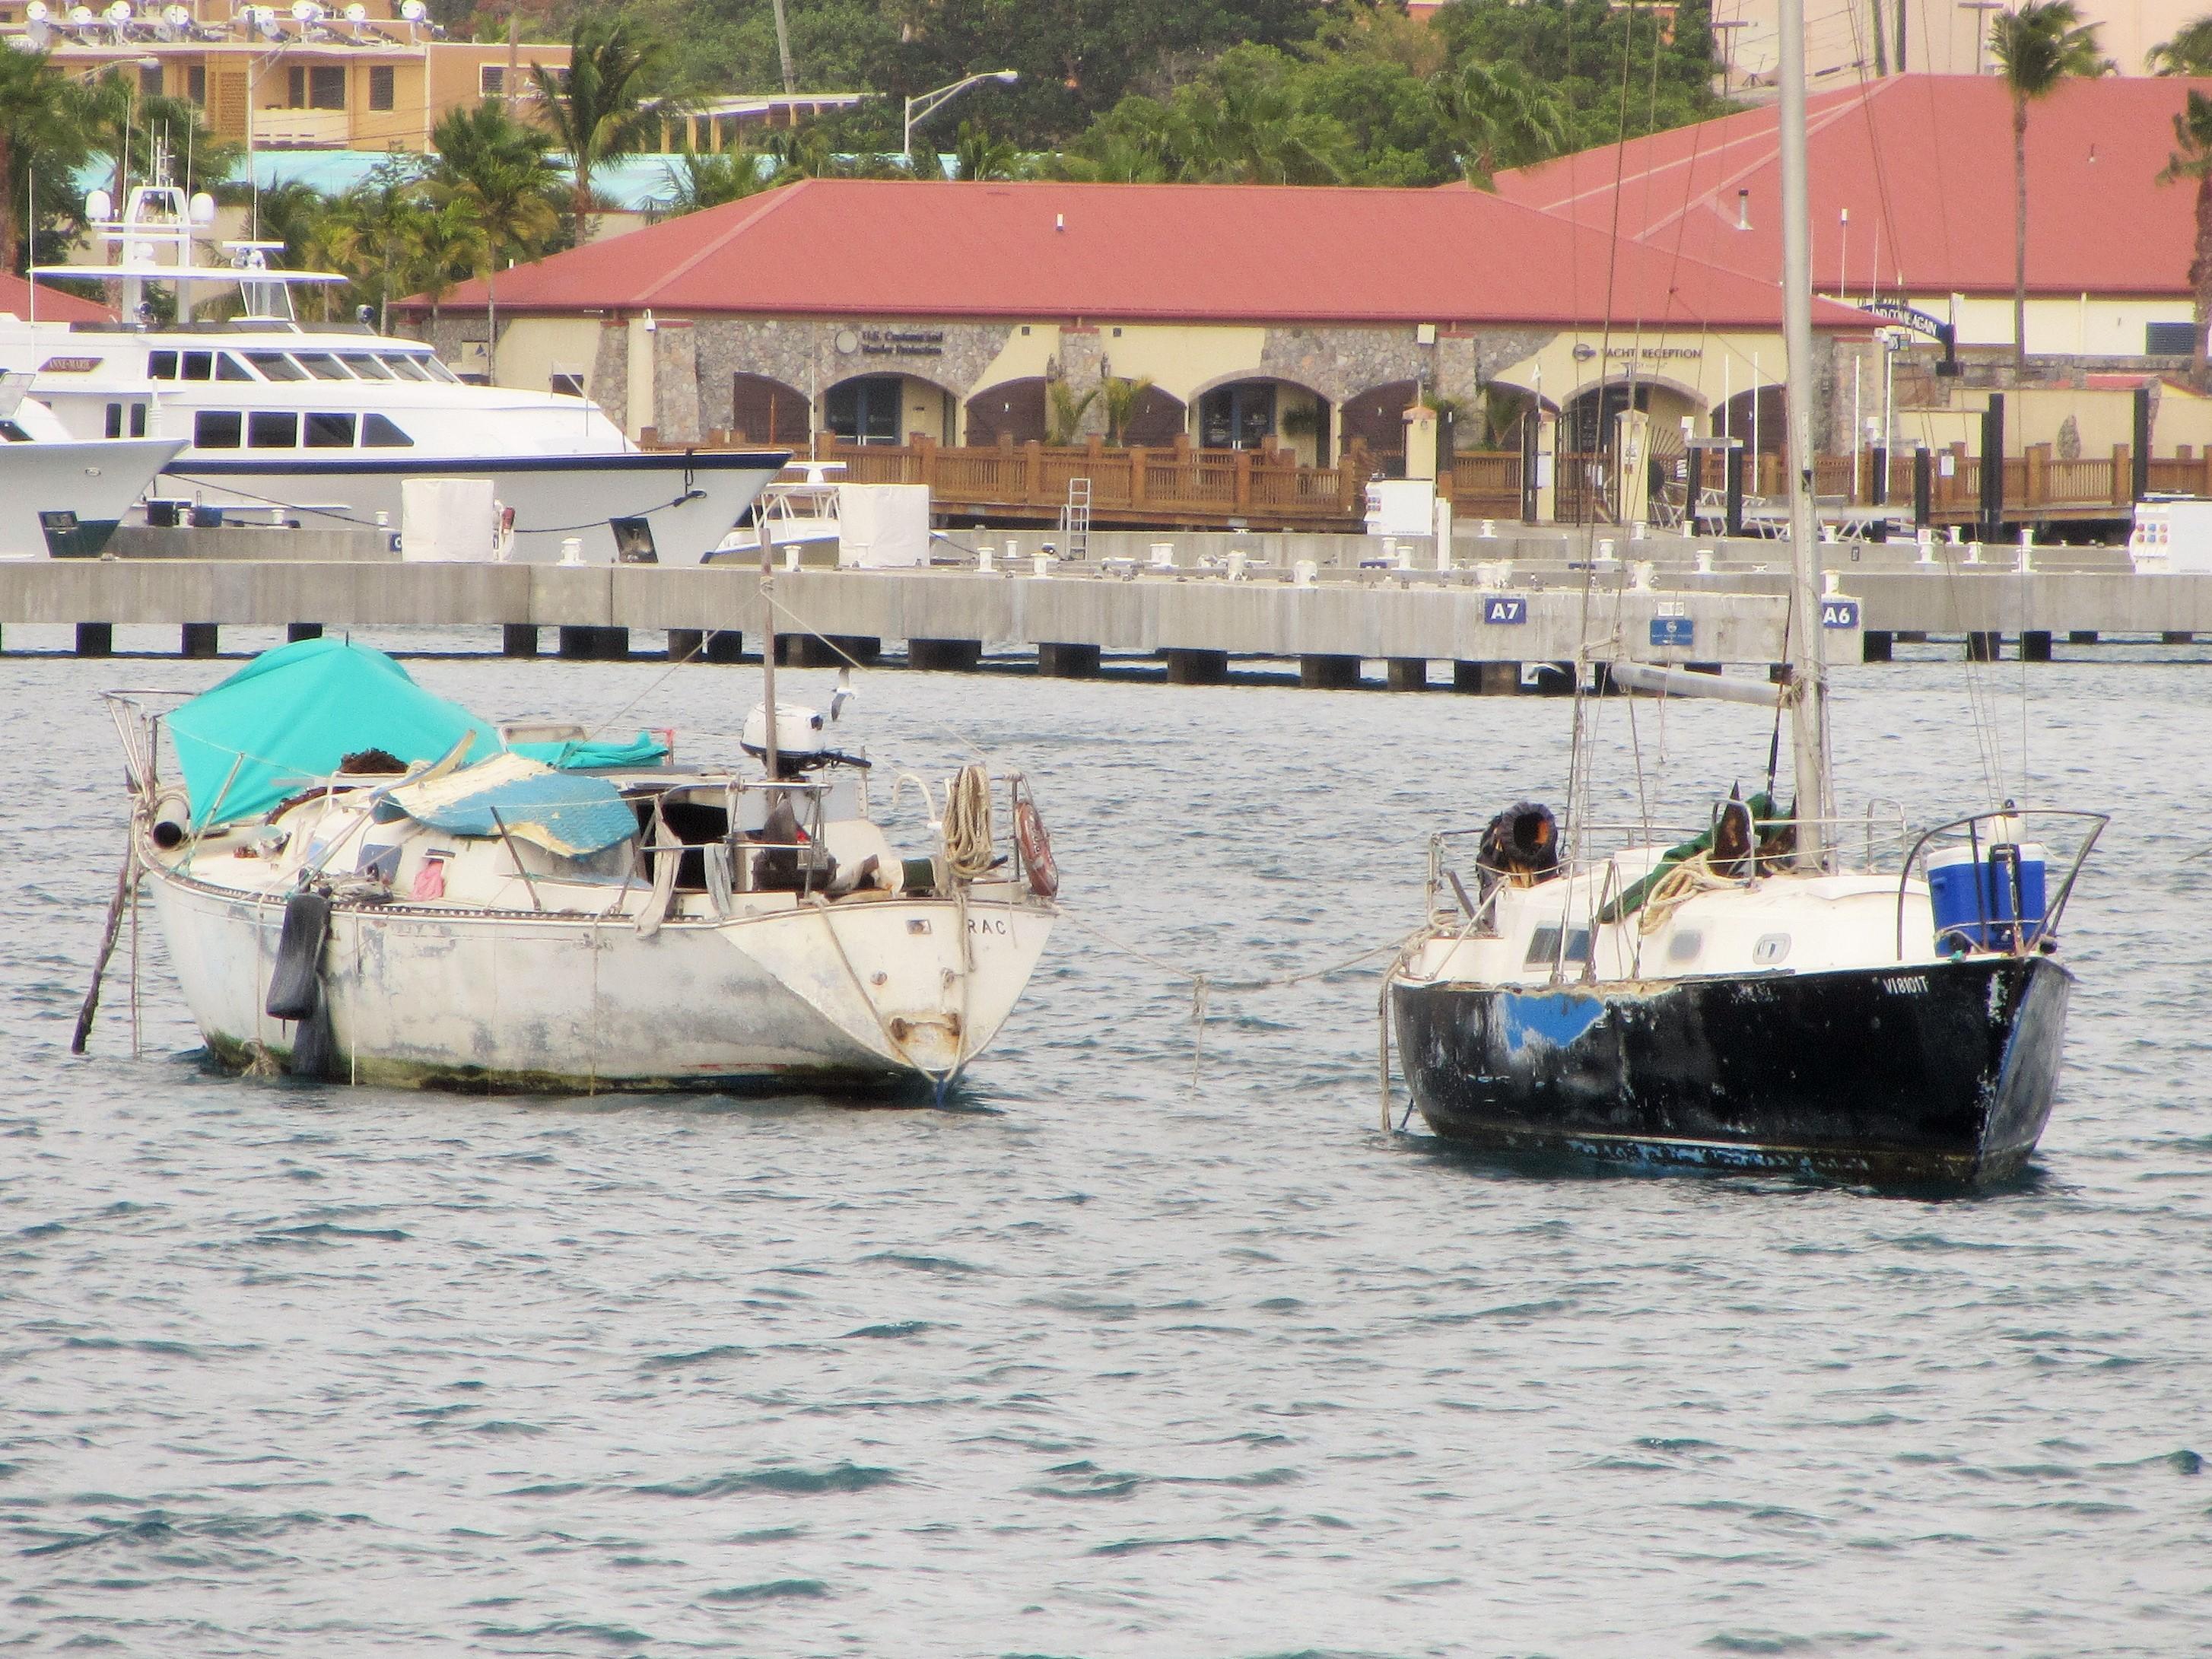 Deralic Boats